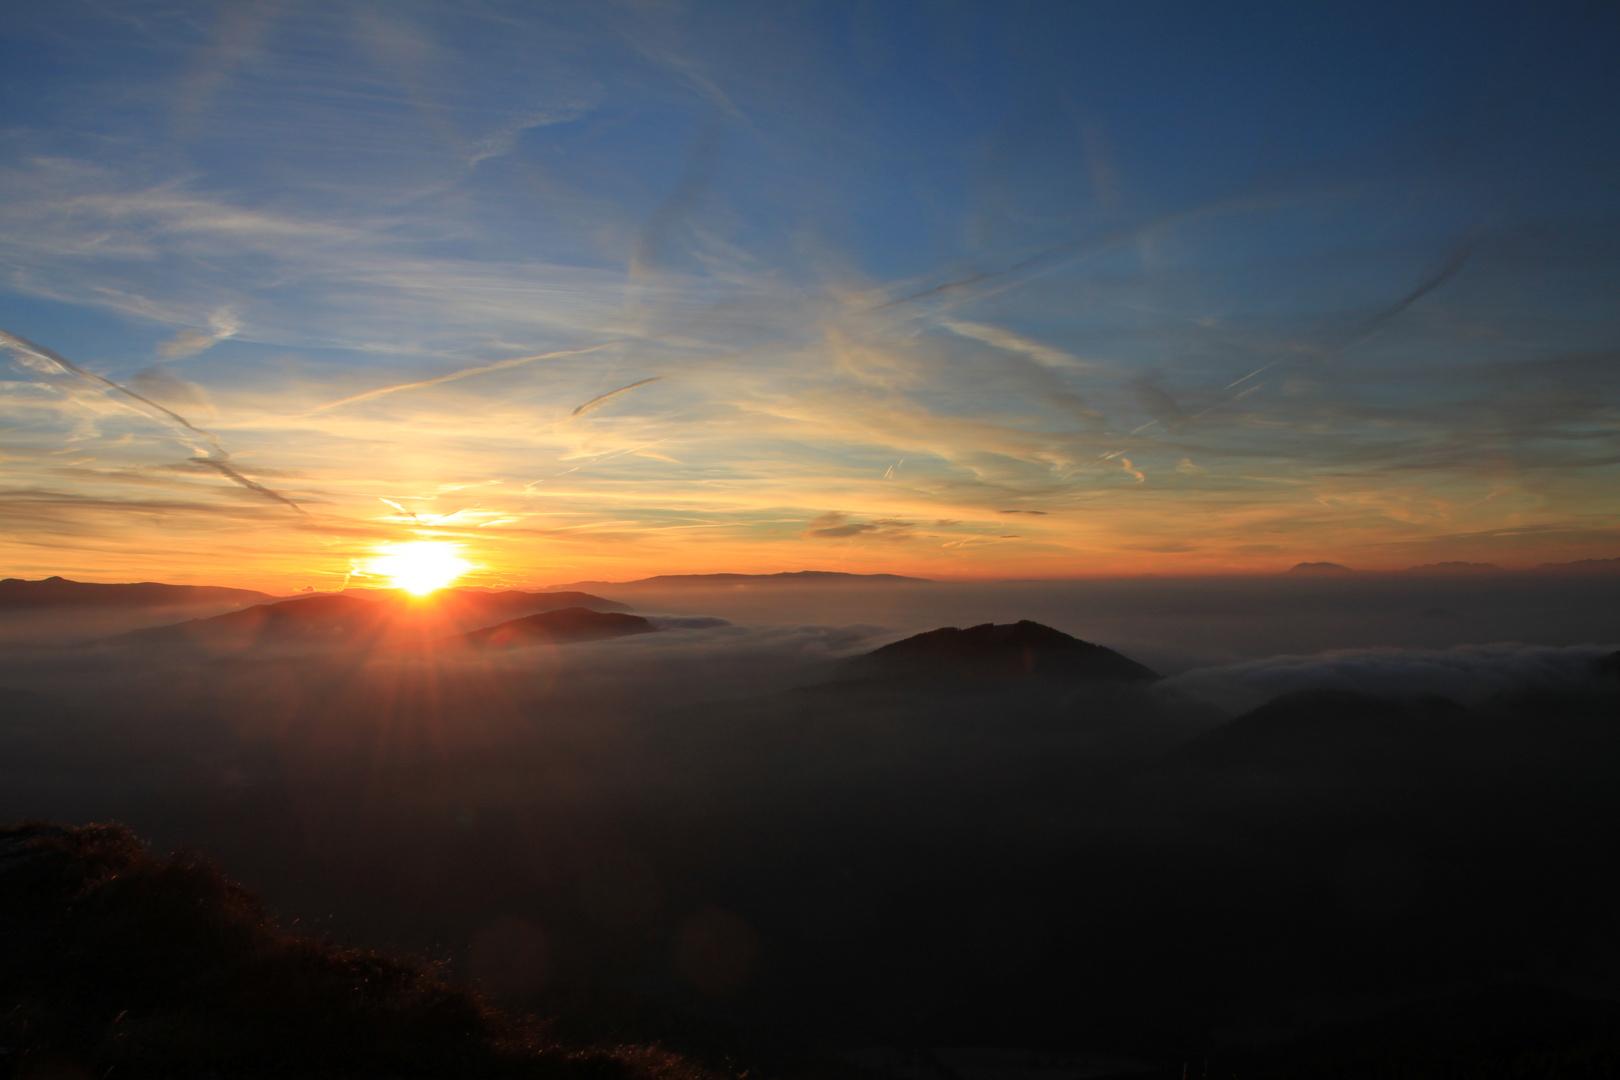 Sonnenaufgang Frauenalpe Murau